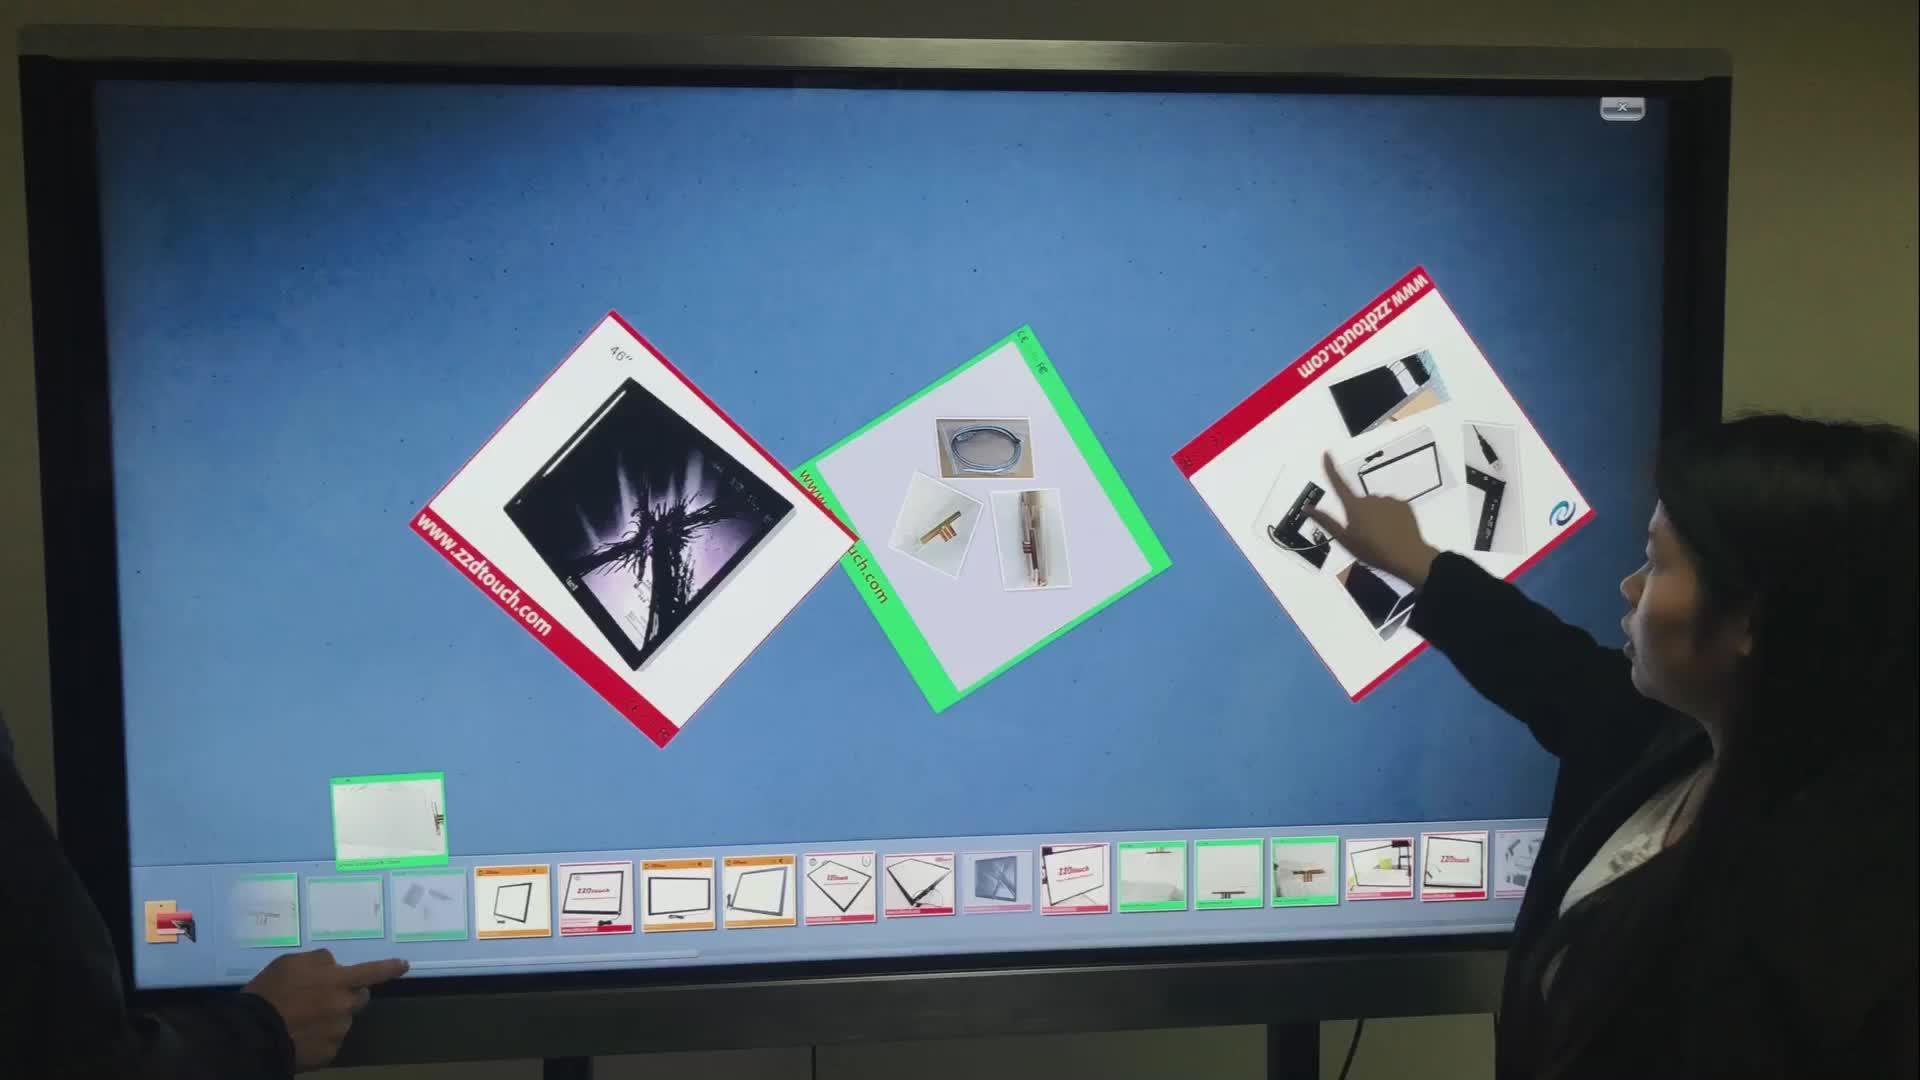 Precio de fábrica/2/4/6/10 puntos táctil 21,5 pulgadas infrarrojos panel de pantalla táctil monitor marco quiosco de diseño personalizado 10-600 pulgadas